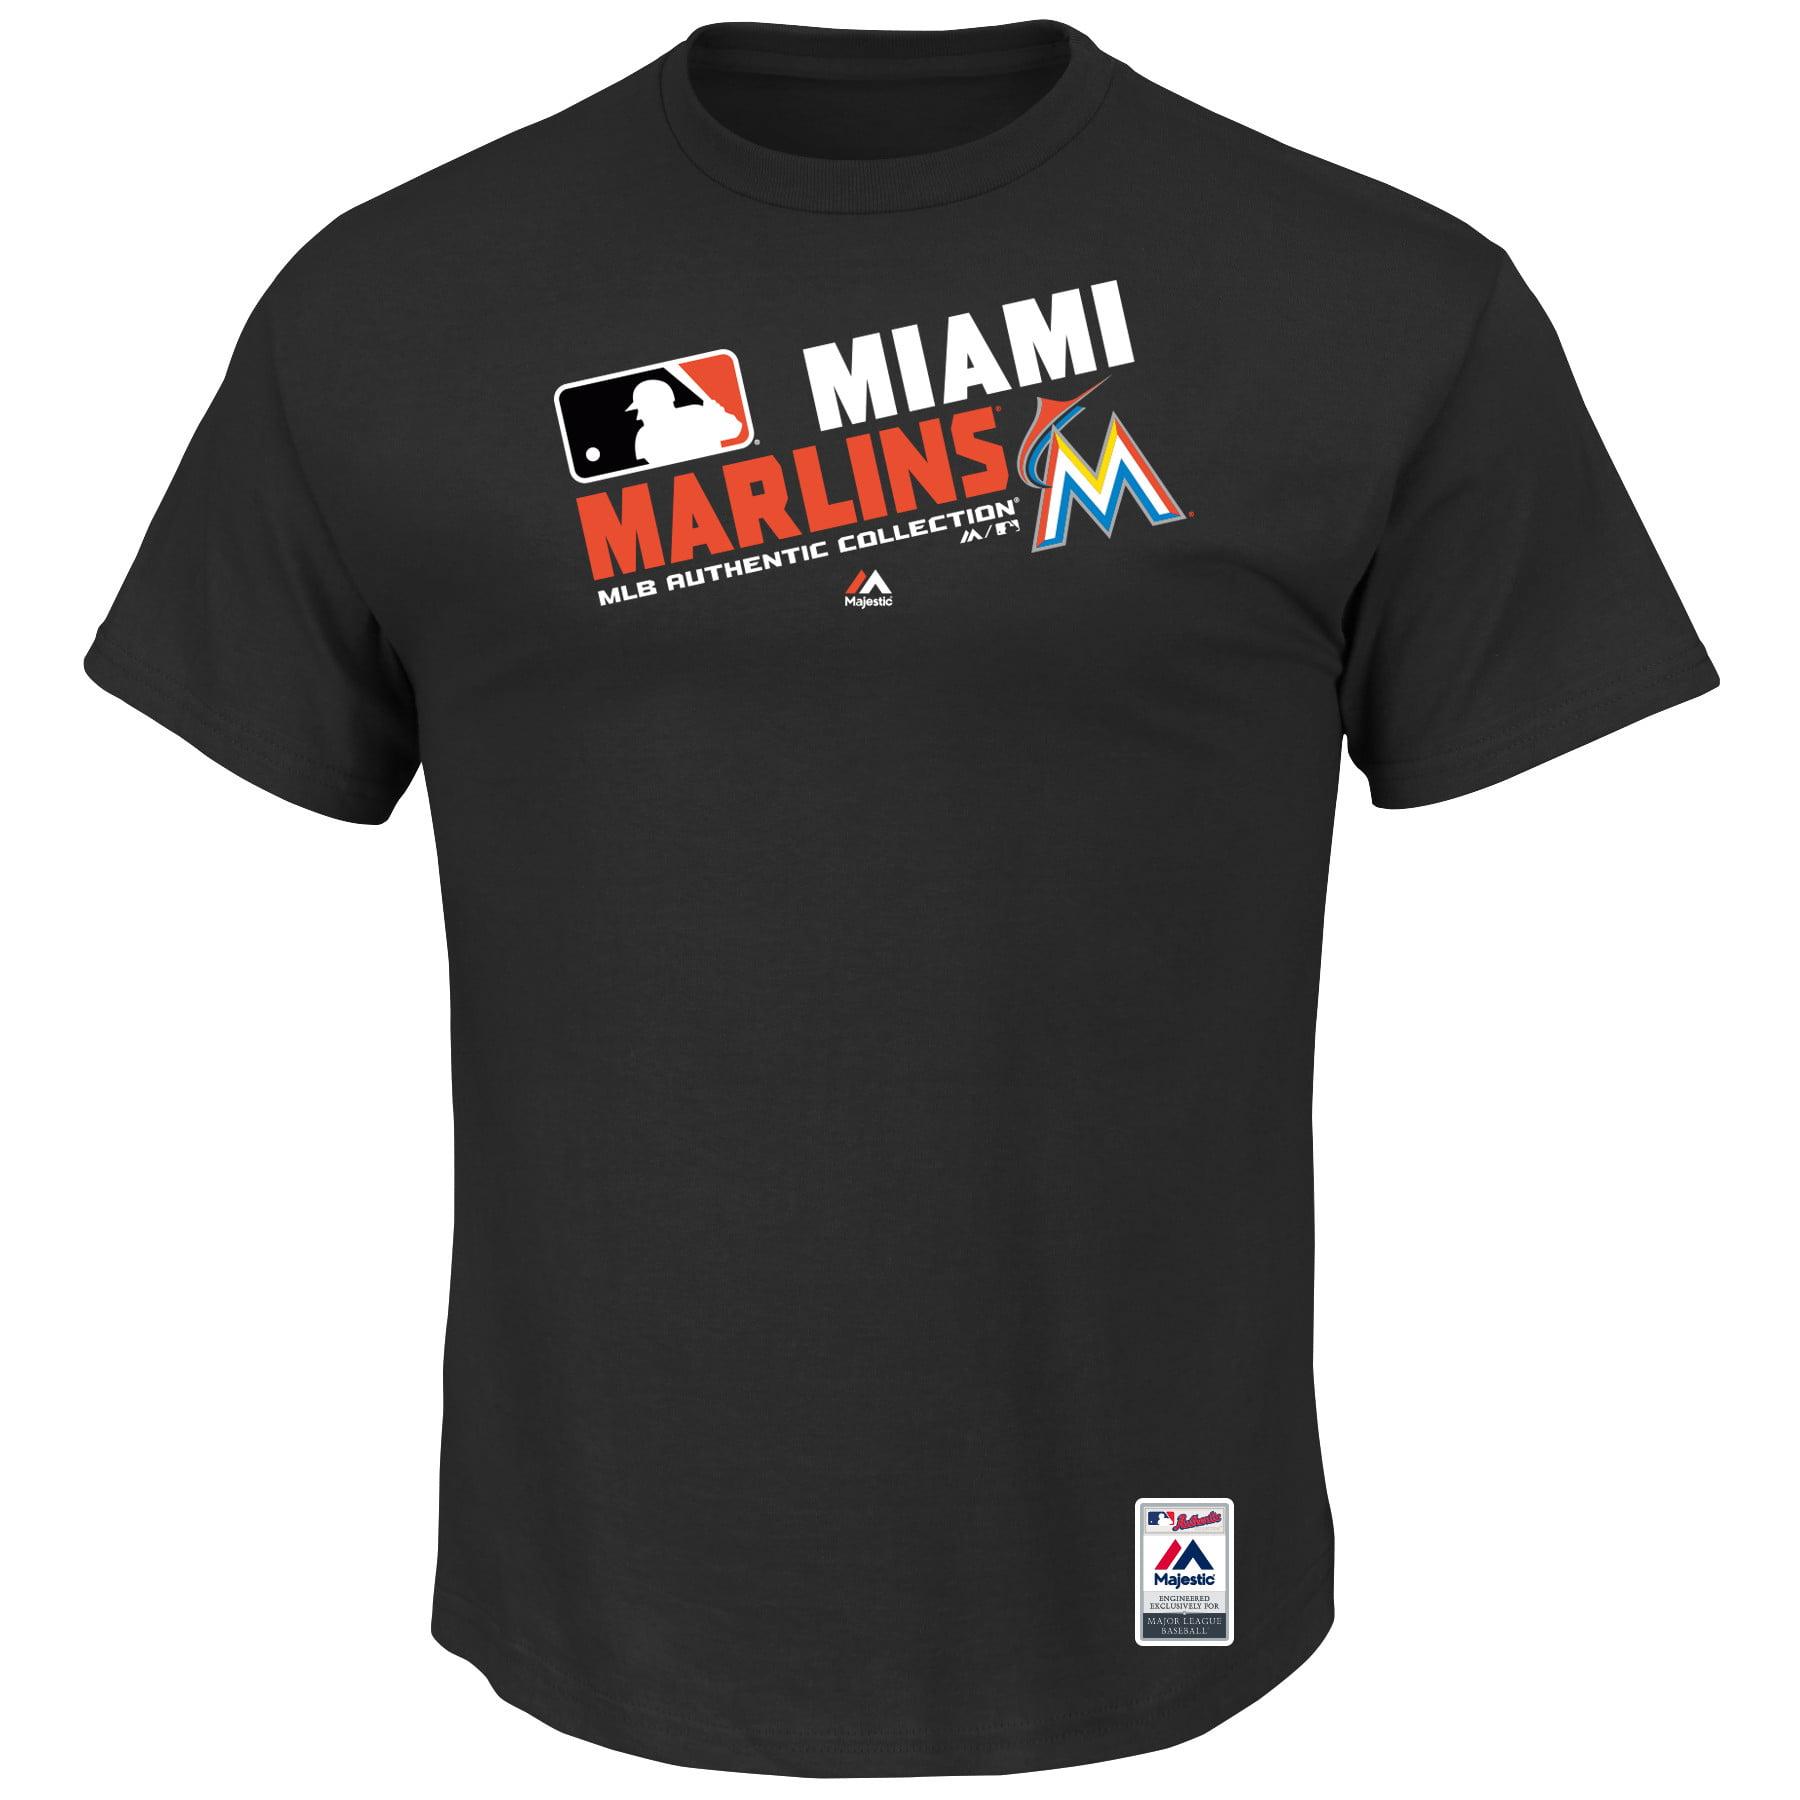 Miami Marlins Majestic Team Choice T-Shirt - Black